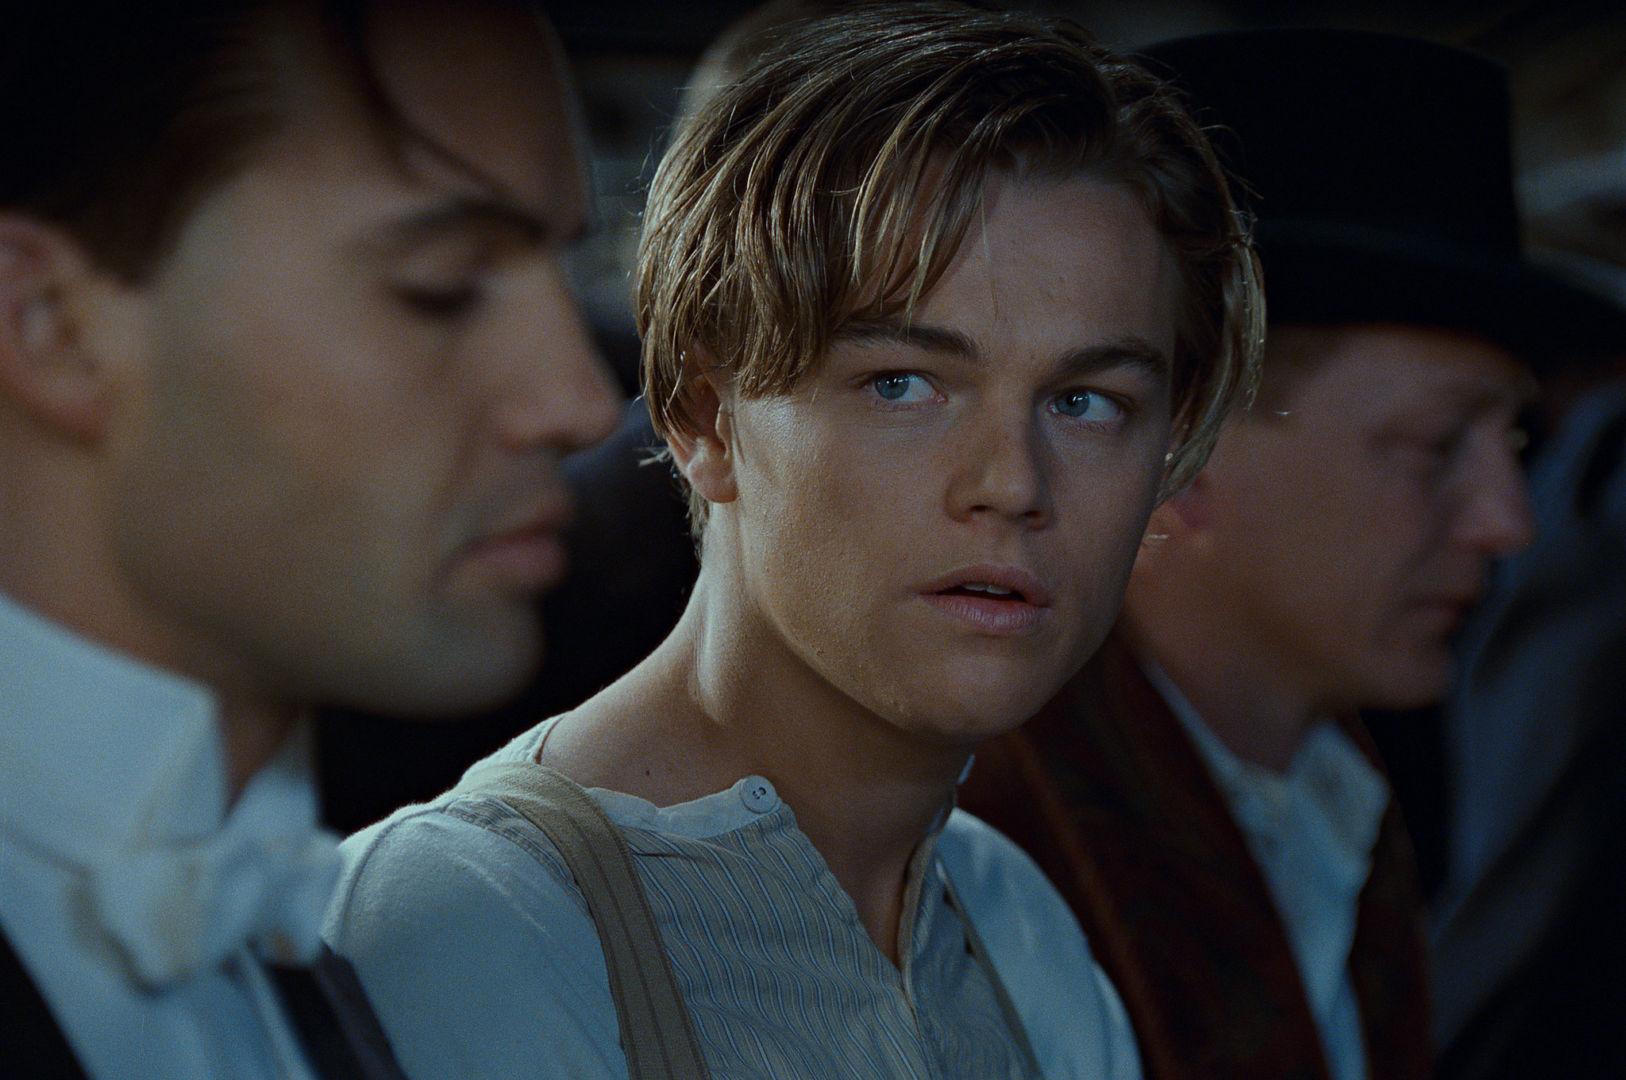 Billy-Zane-Leonardo-DiCaprio-Titanic